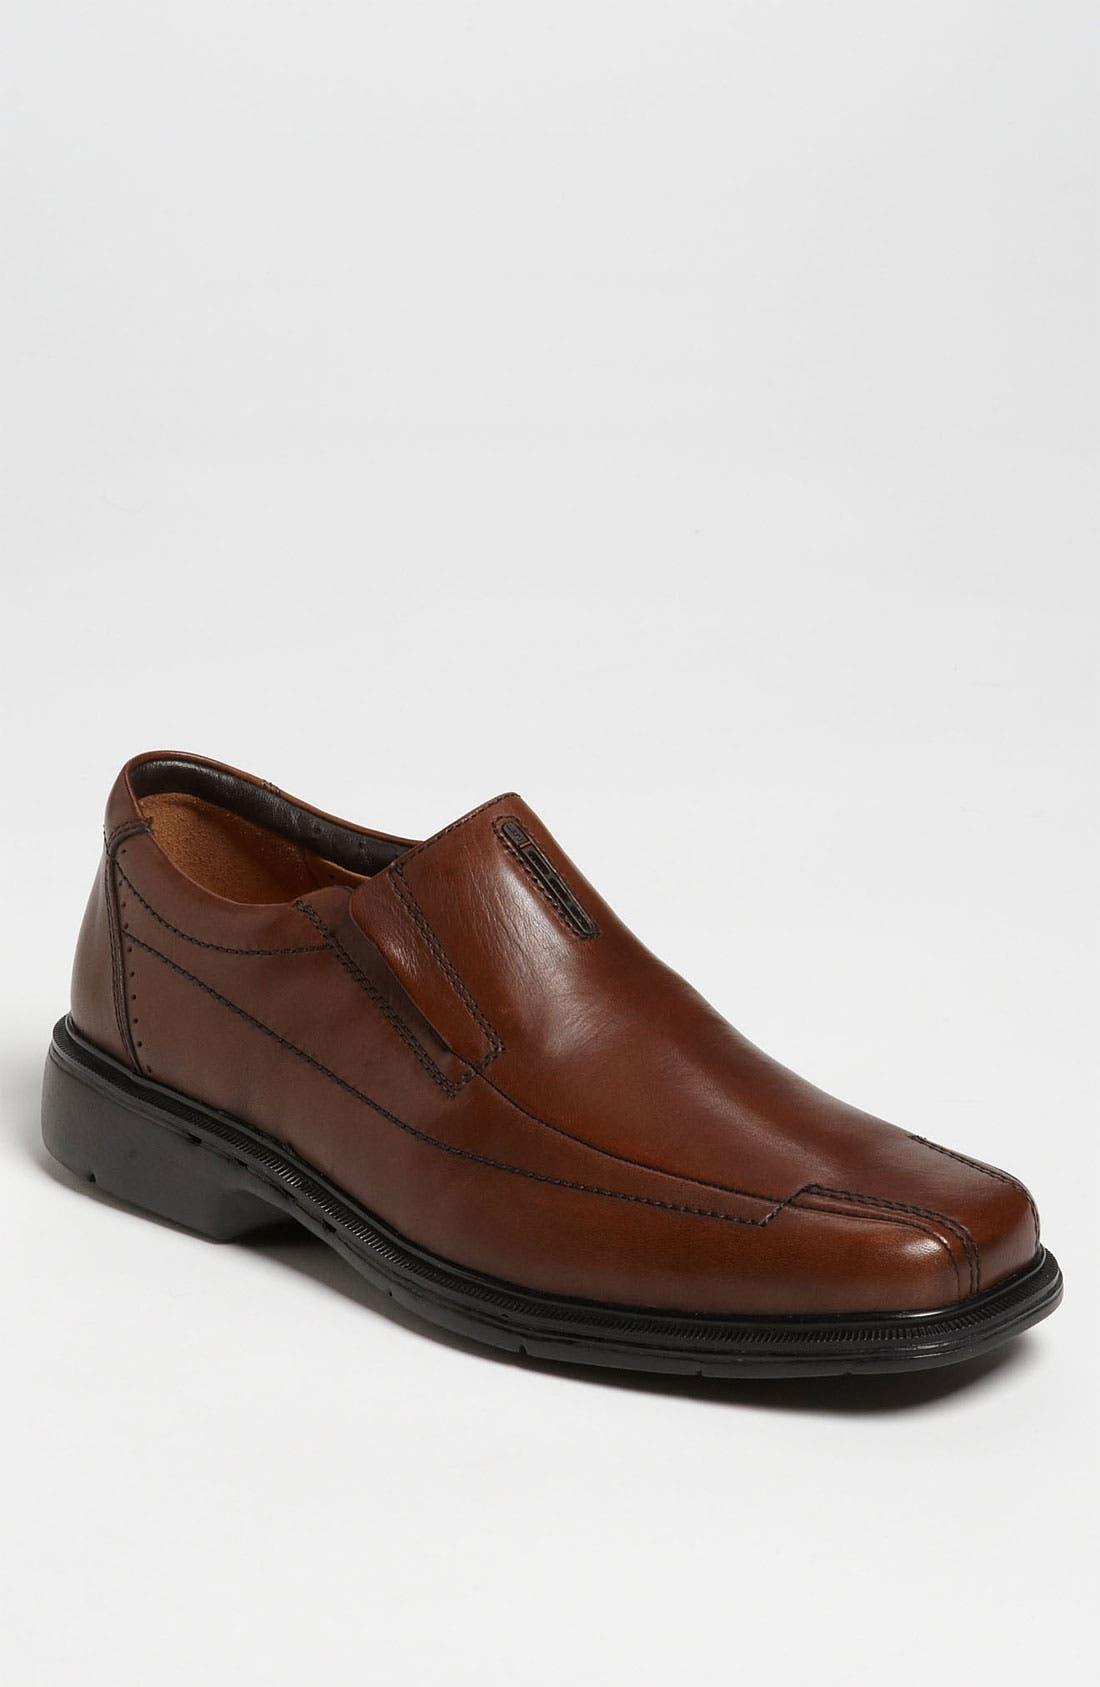 Men's Clarks 'Un. sheridan' Slip-On